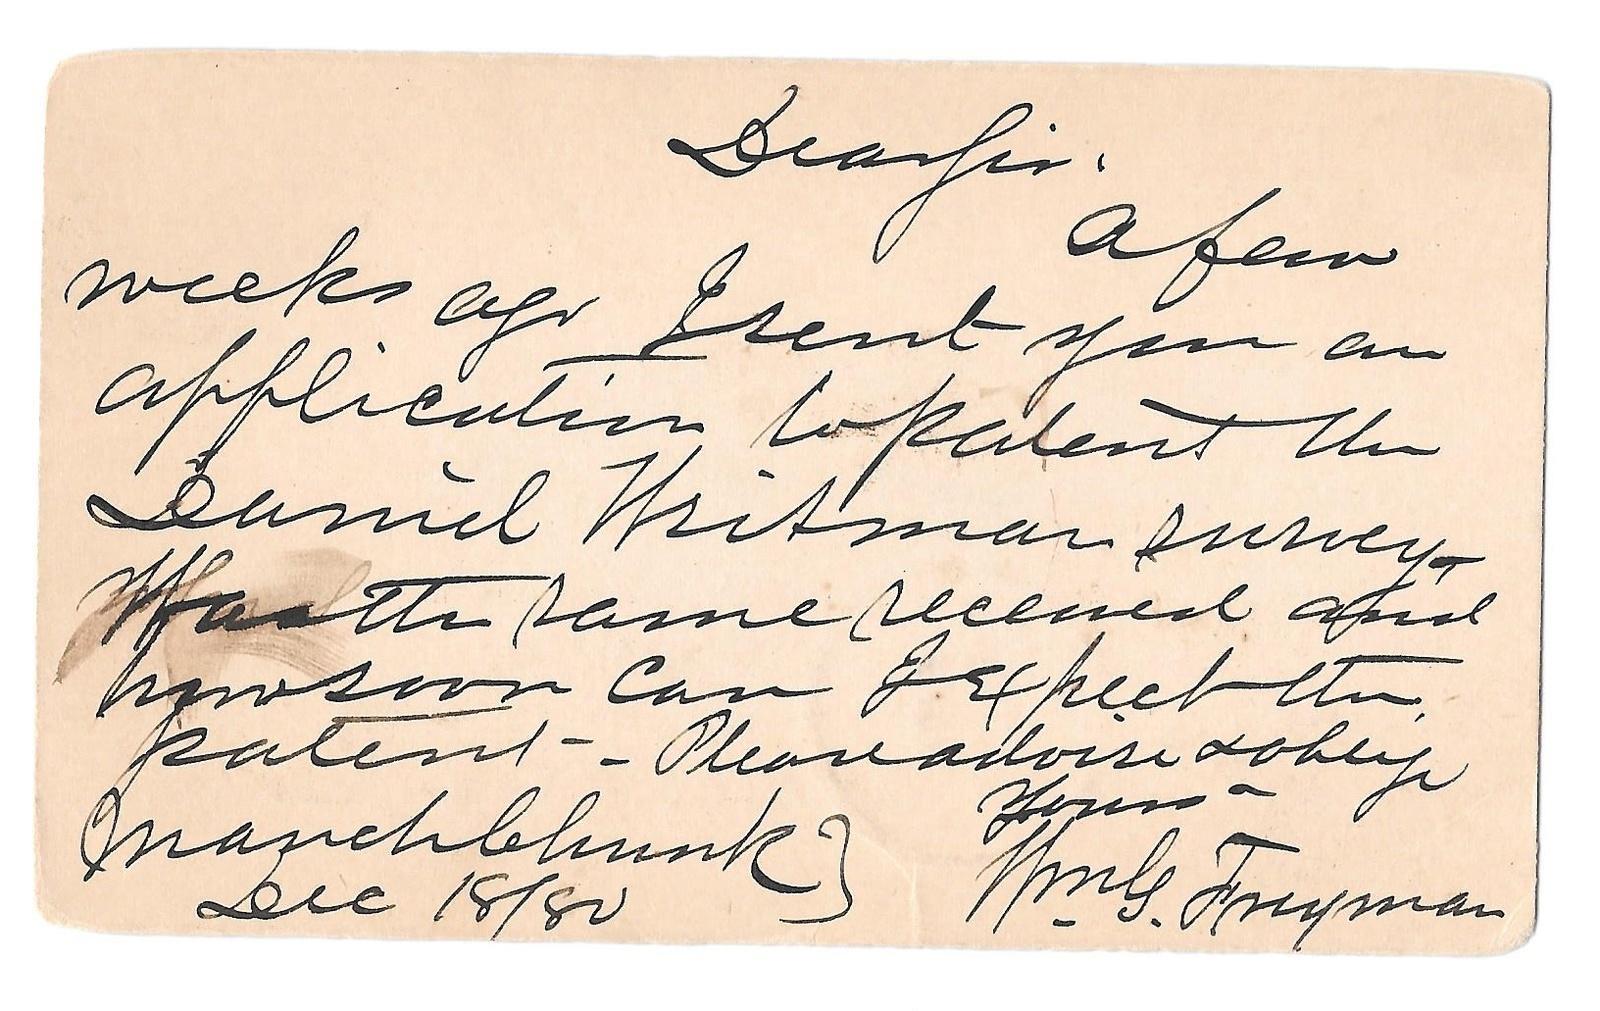 UX5 DPO Mauch Chunk PA 1880 Fancy Bullseye Target Cancel Postal Card Freyman image 2